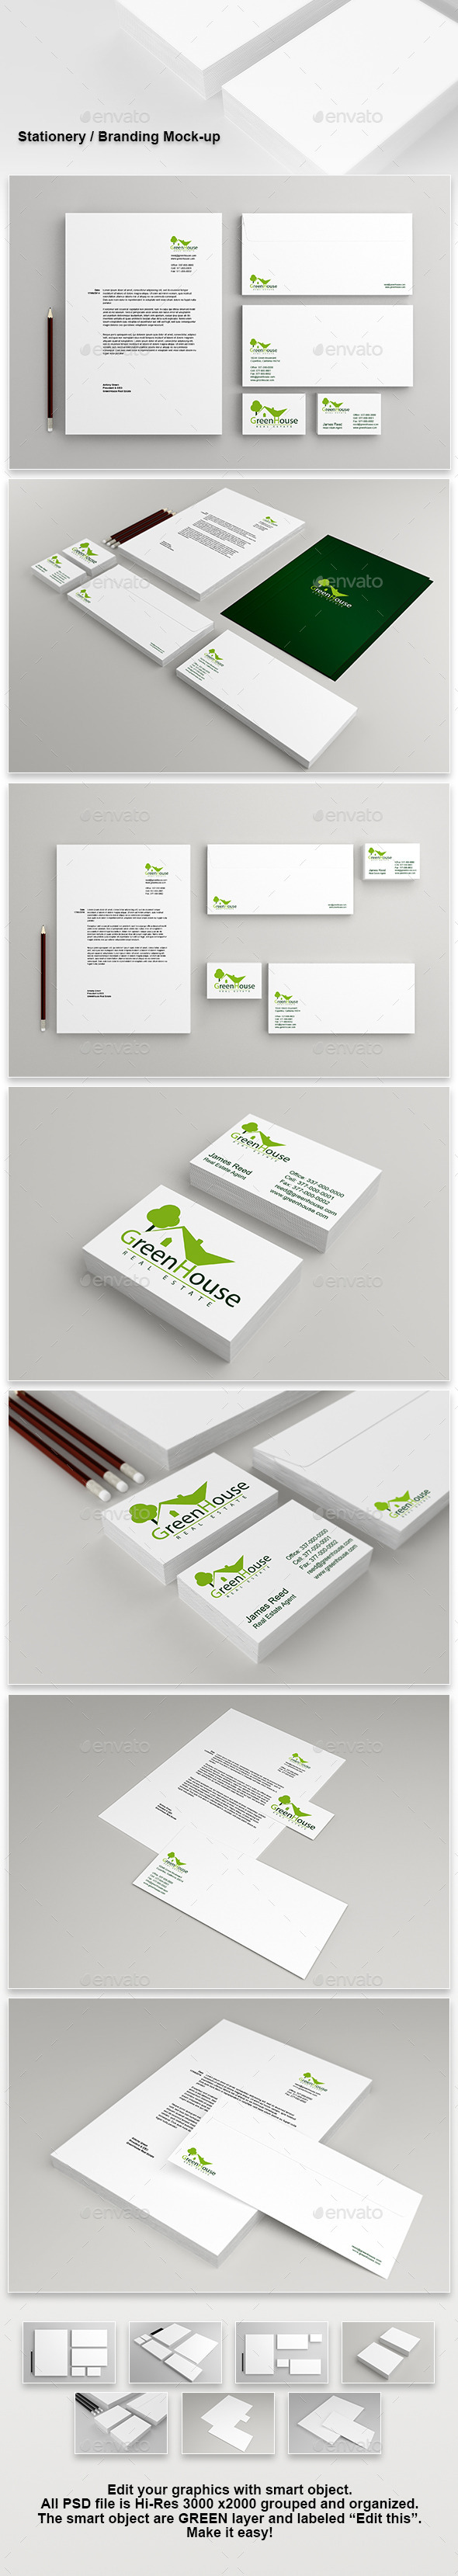 Stationery - Branding Mock-Up - Stationery Print